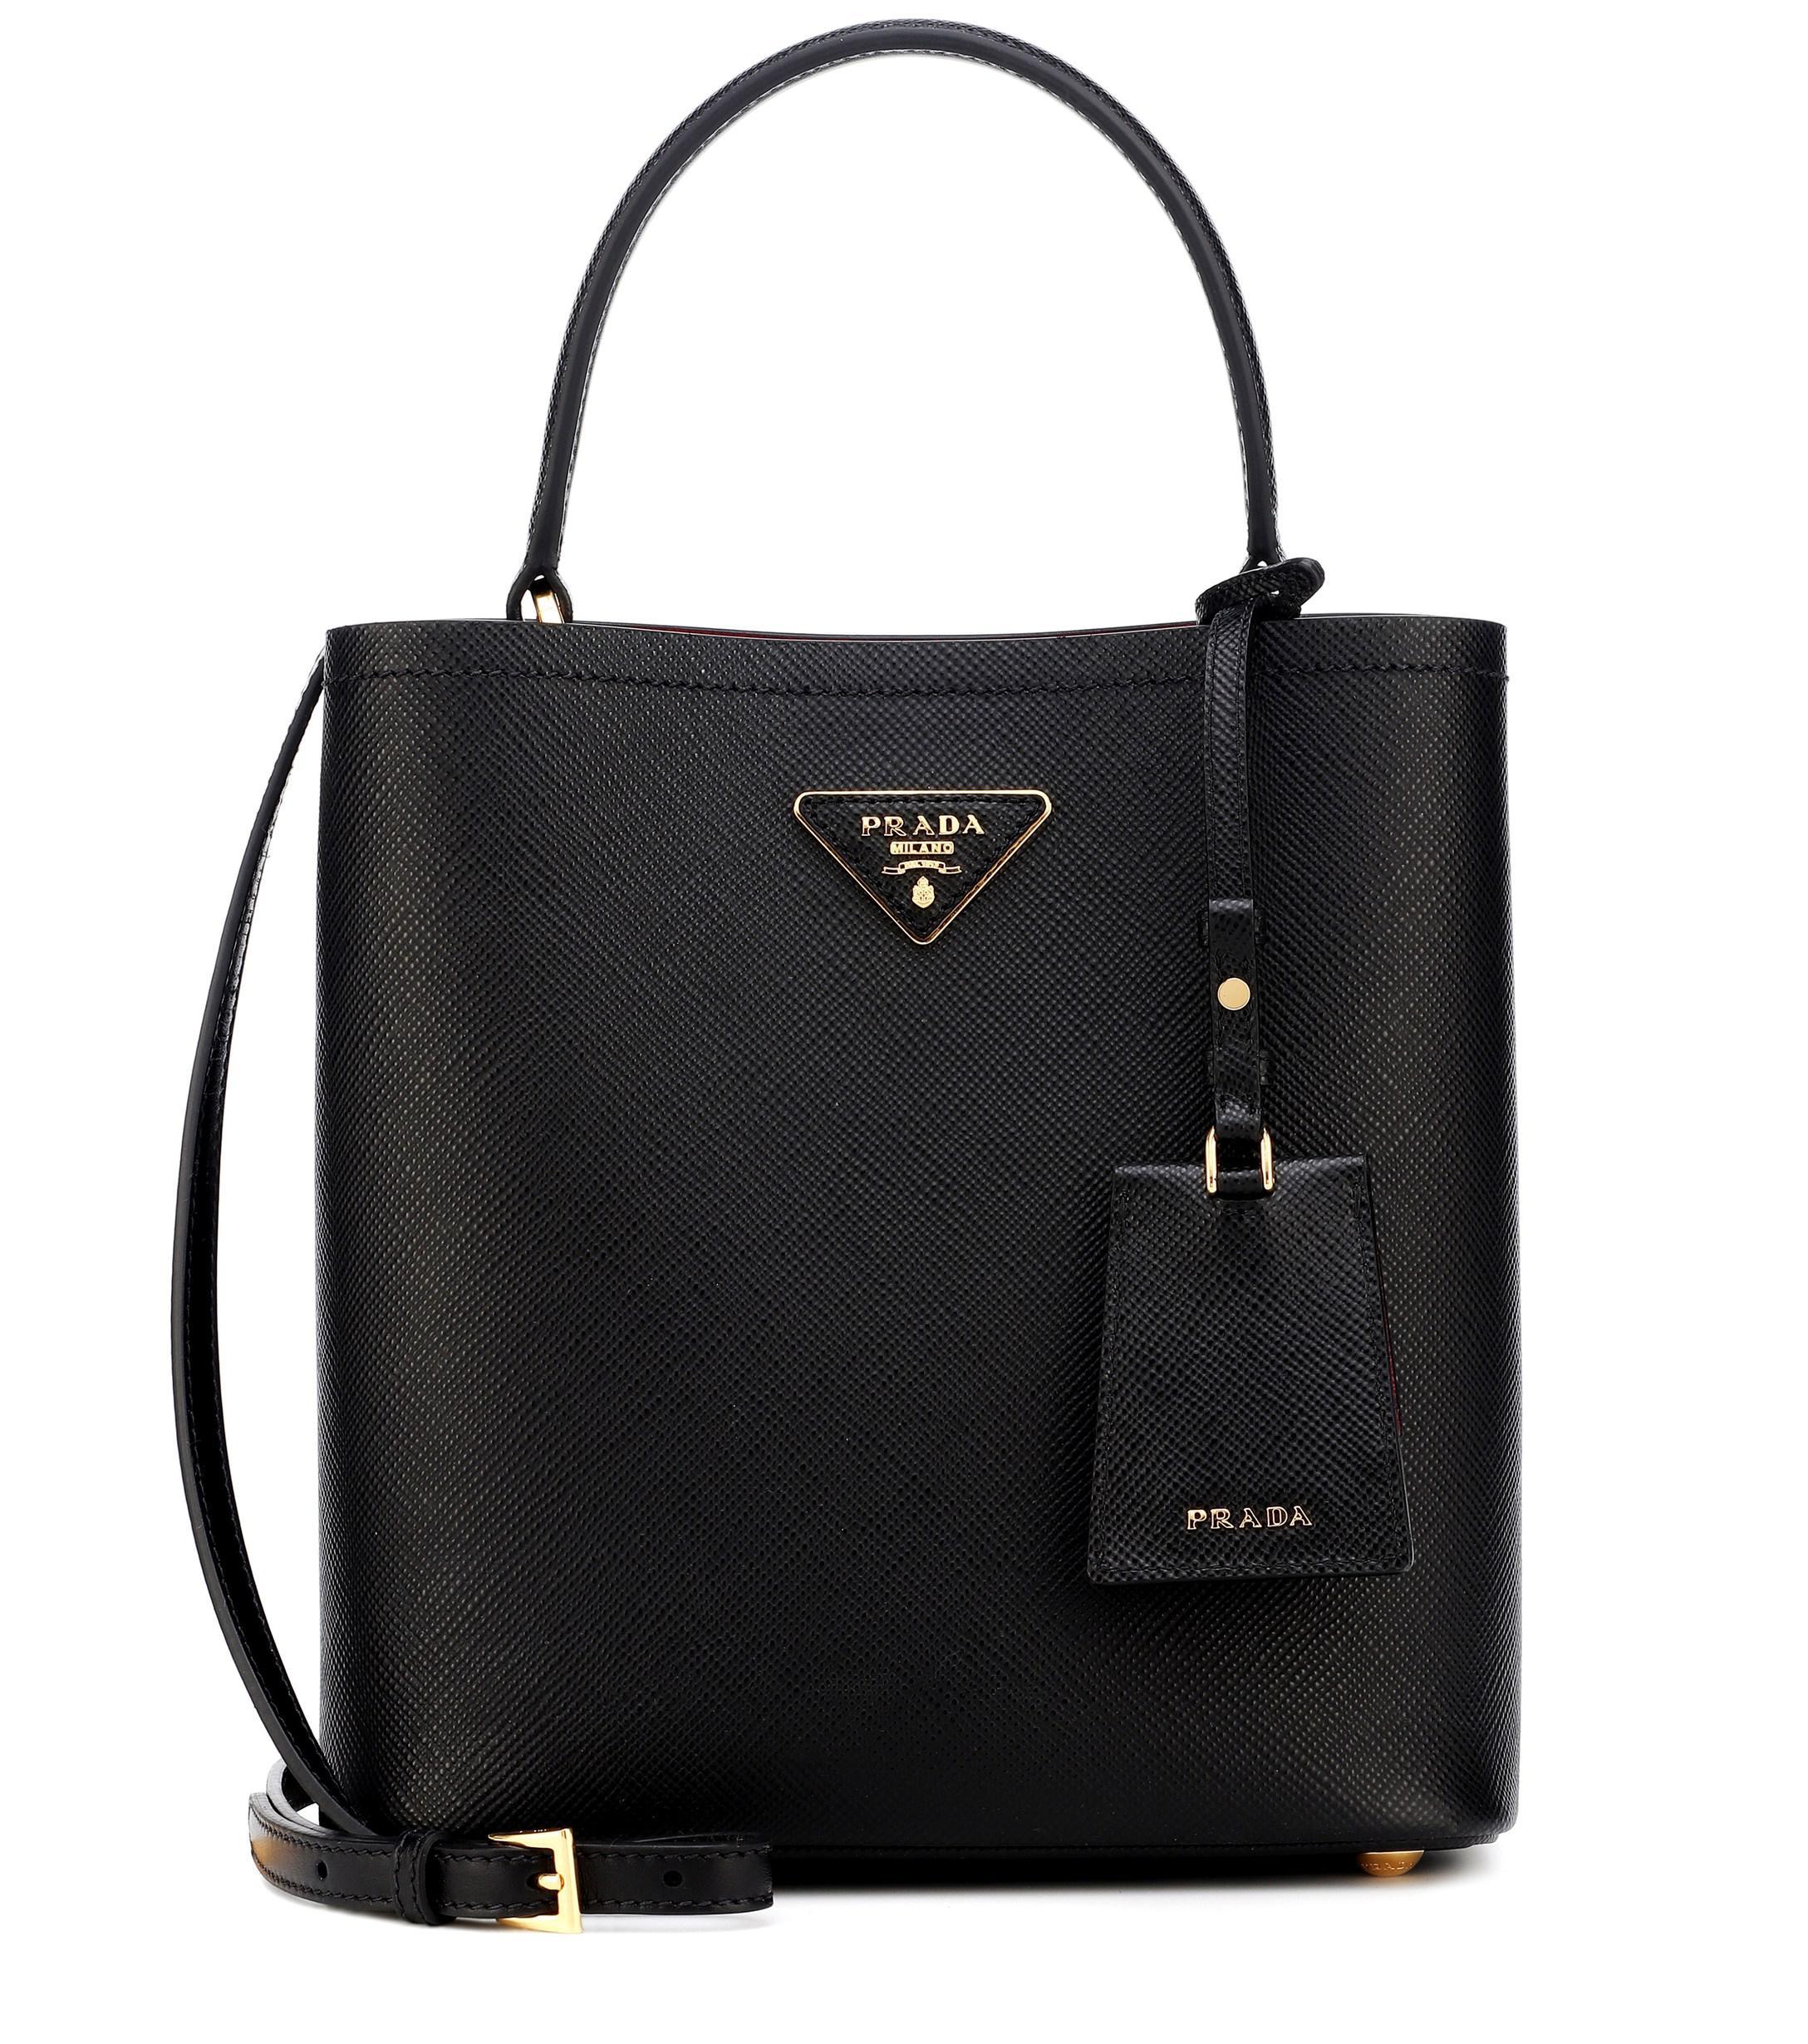 Lyst - Prada Double Medium Leather Bucket Bag in Black e98095a57b24d